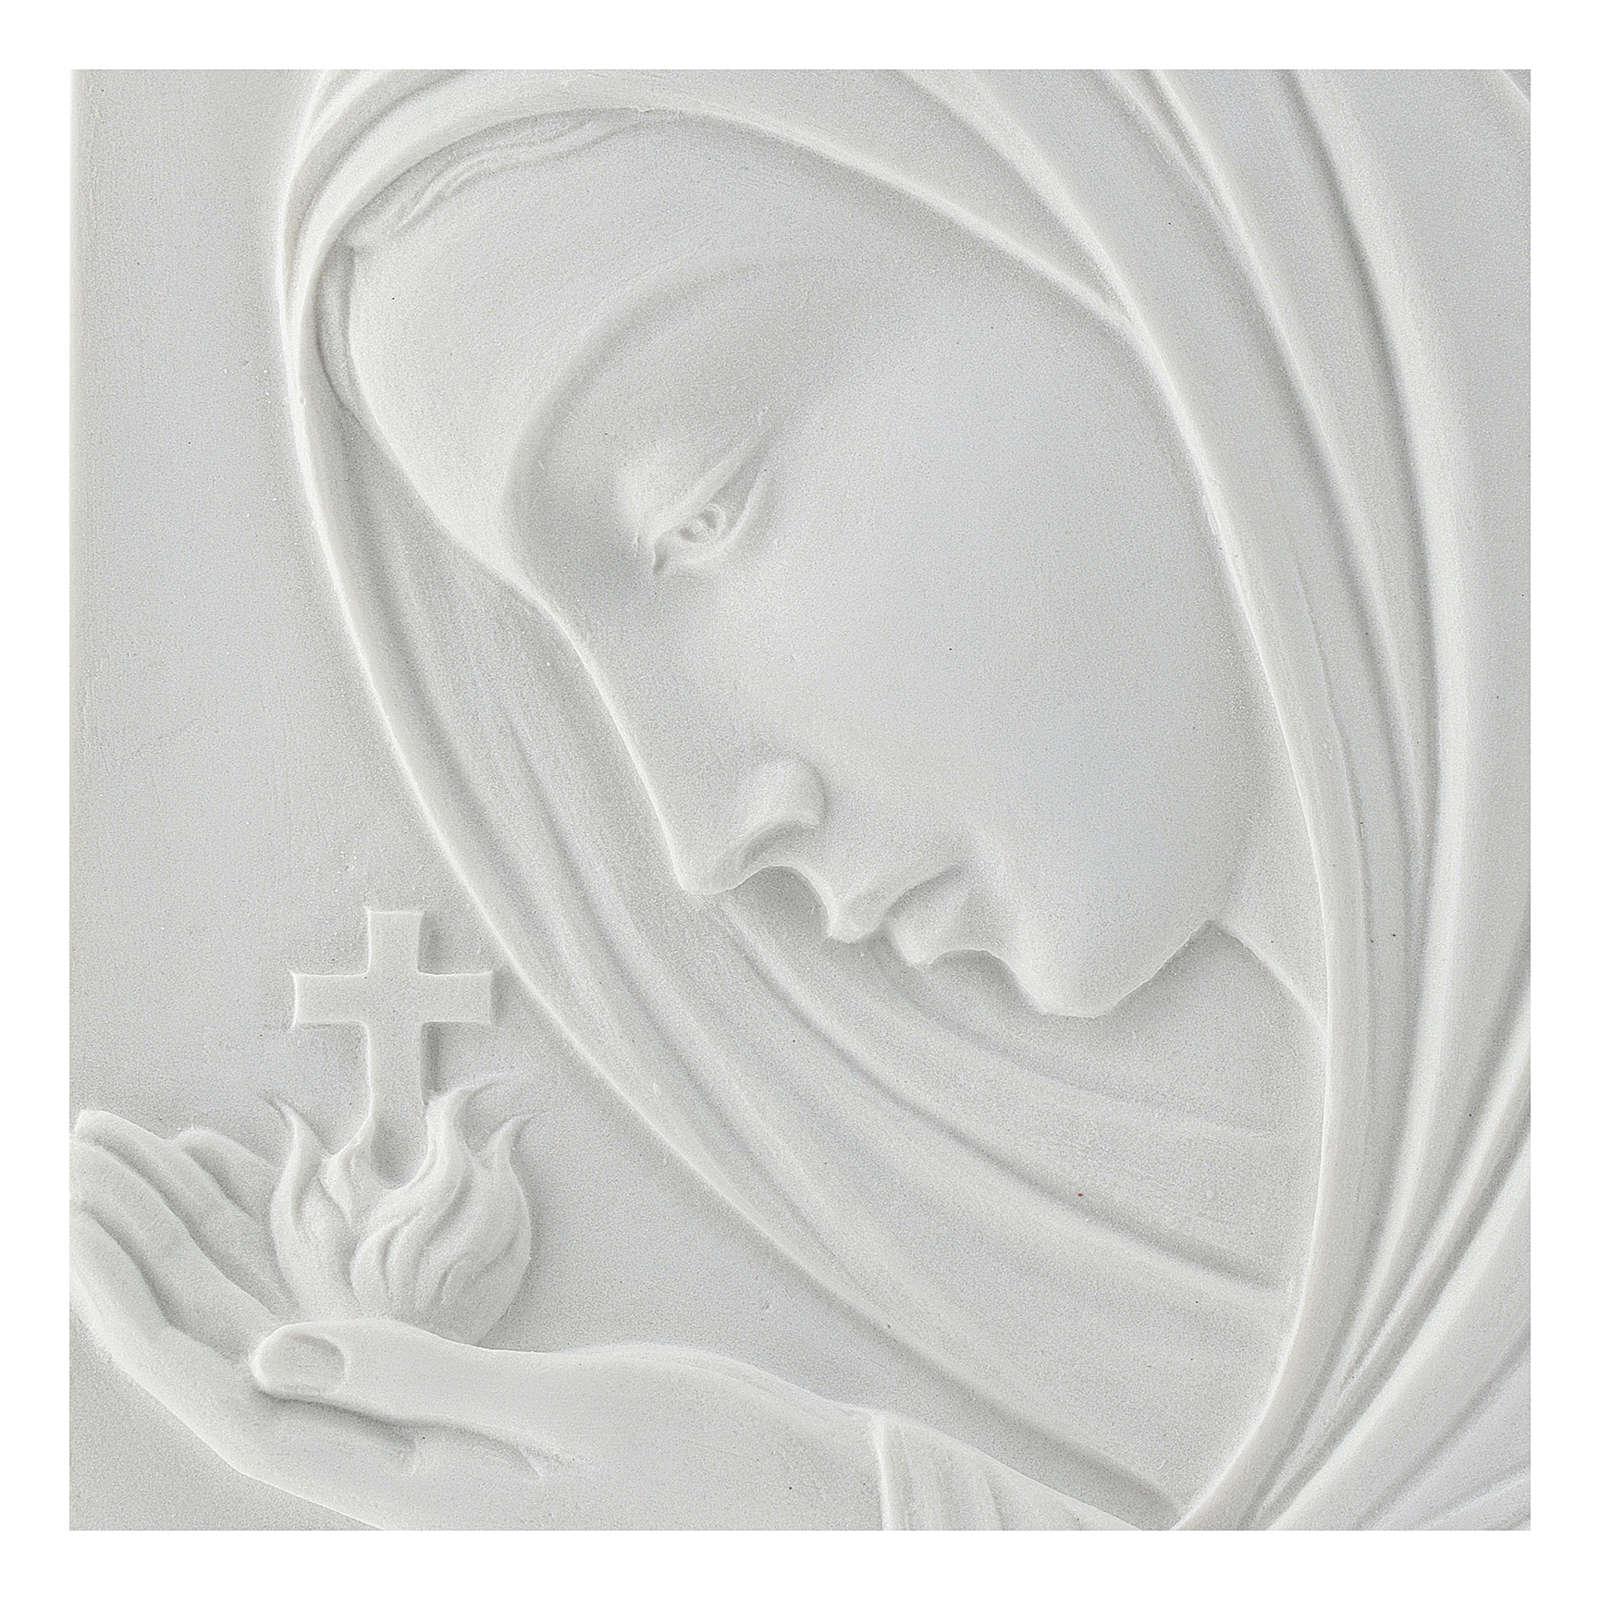 Madonna con croce 22 cm rilievo marmo sintetico 3